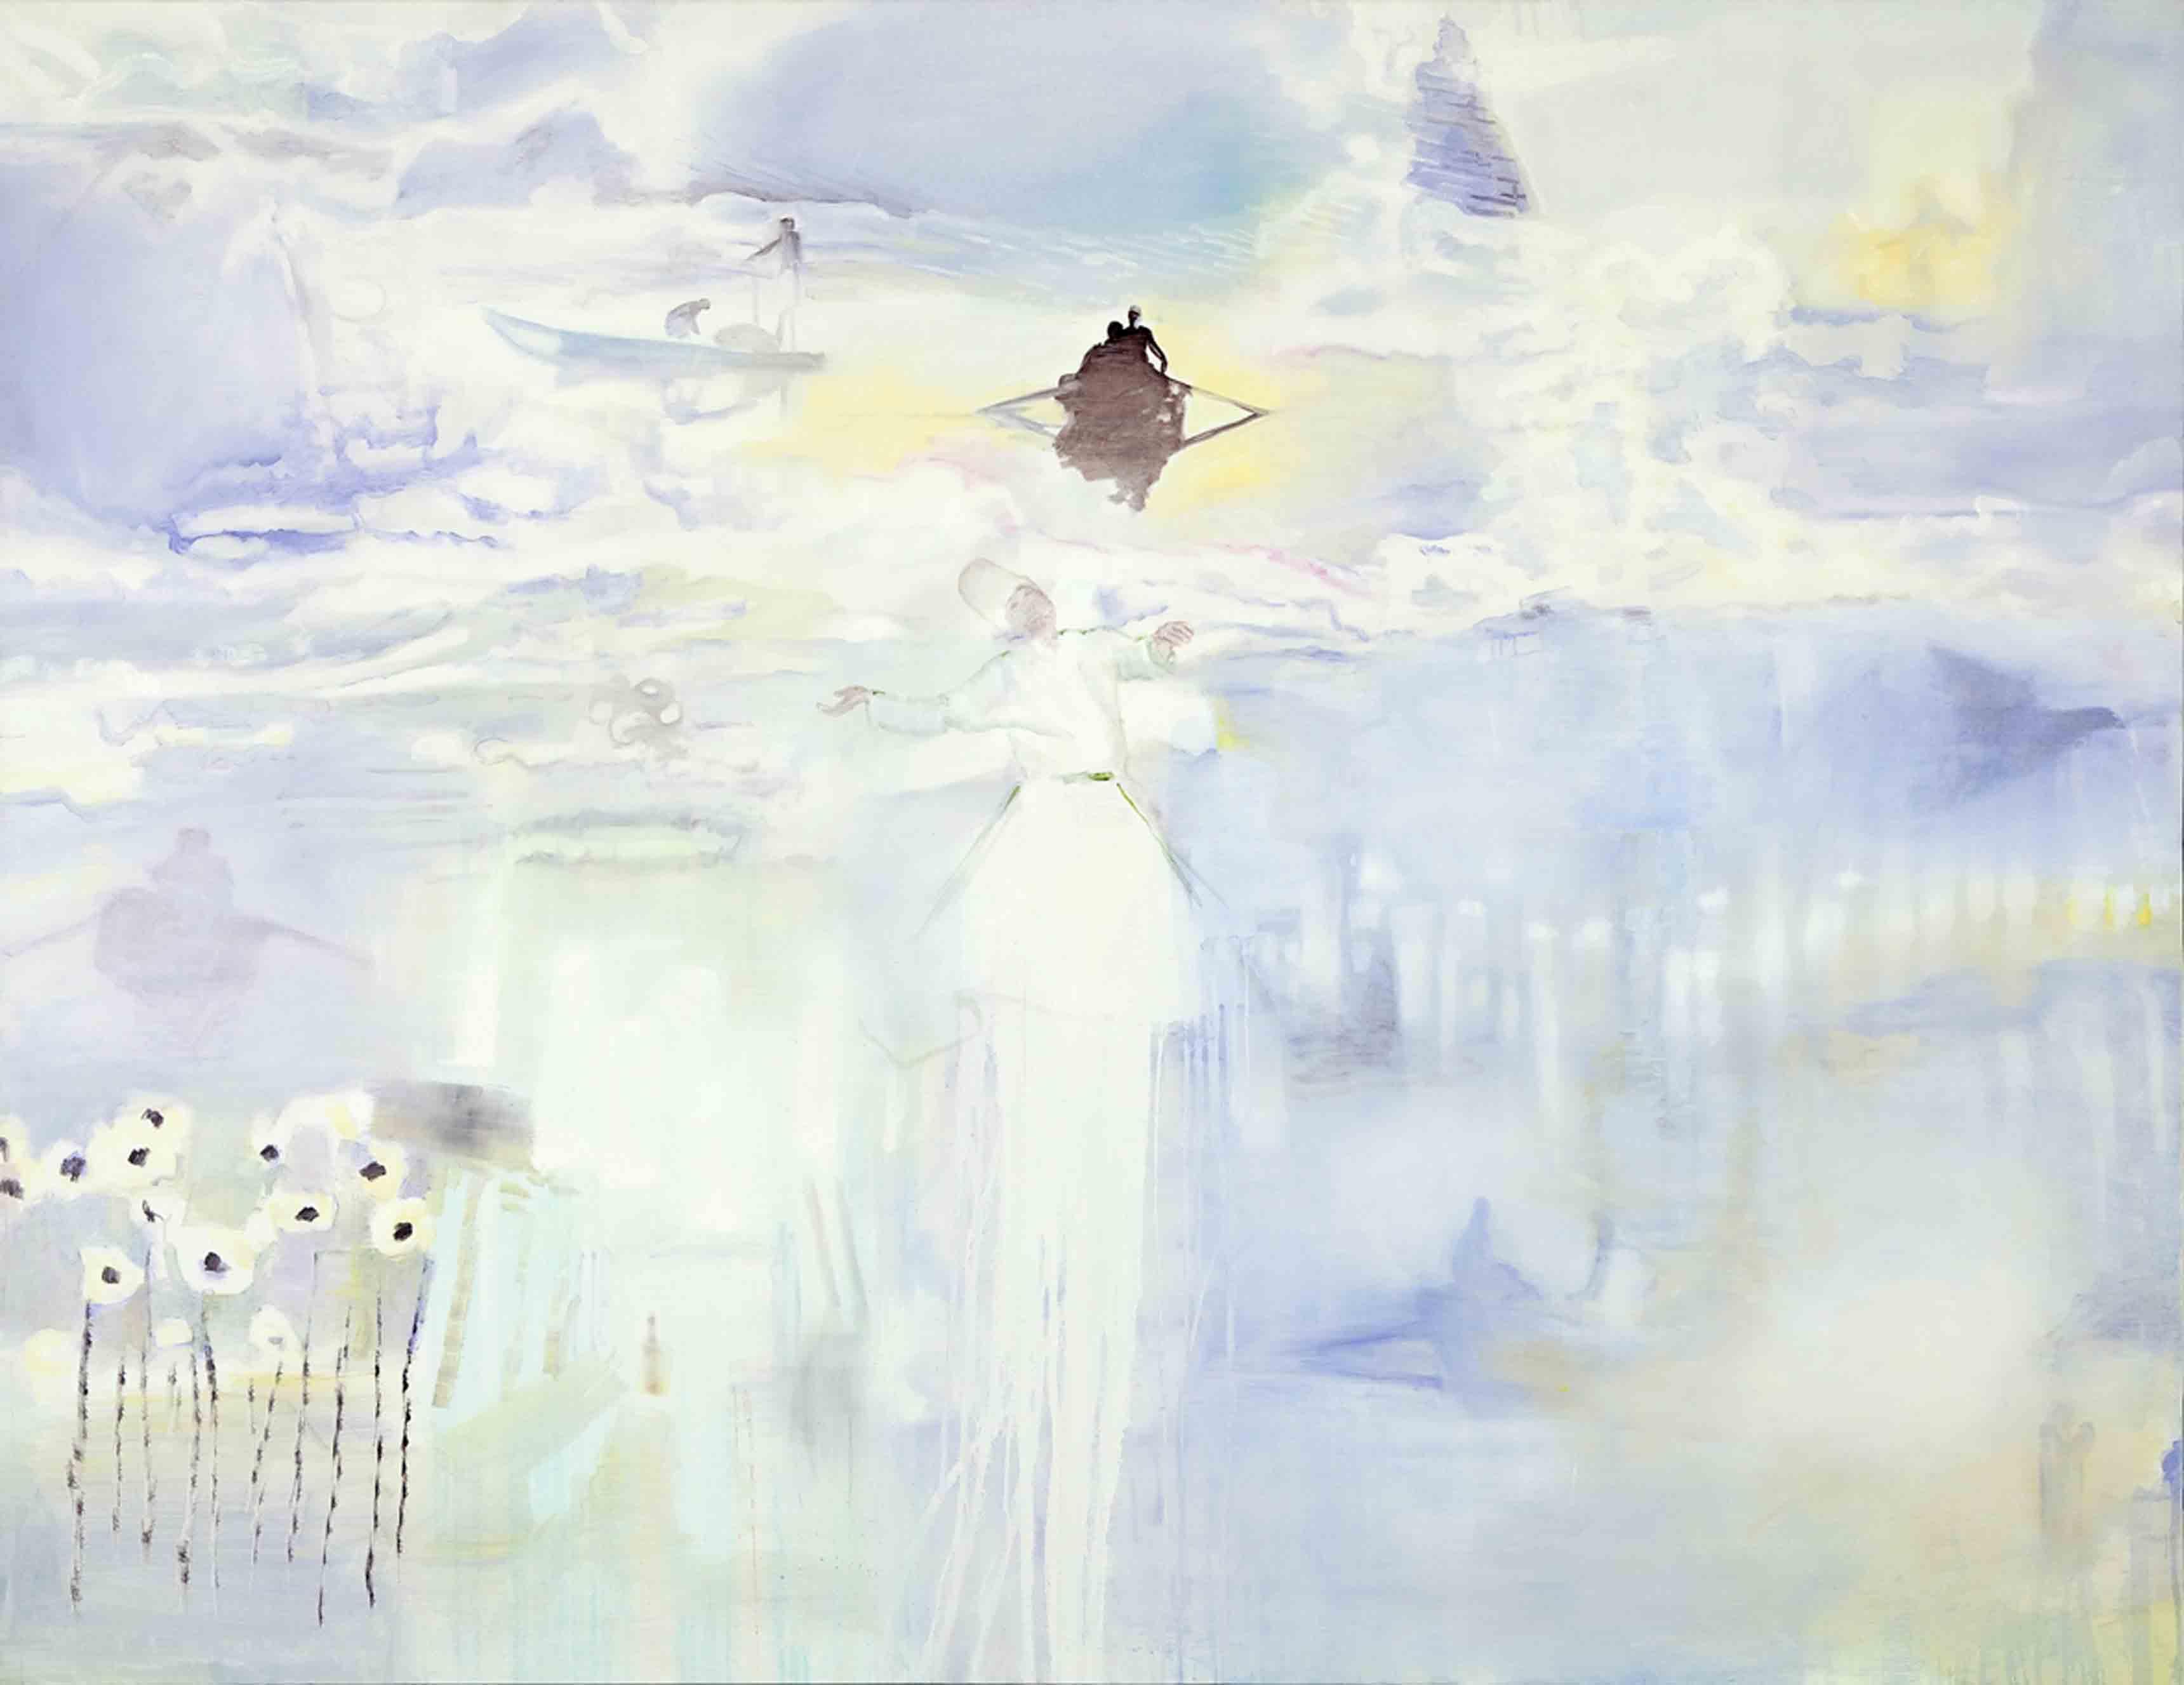 Marina Karella Visible, Invisible, 2009. Courtesy Galerie Mitterrand. Photo : Rebecca Fanuele